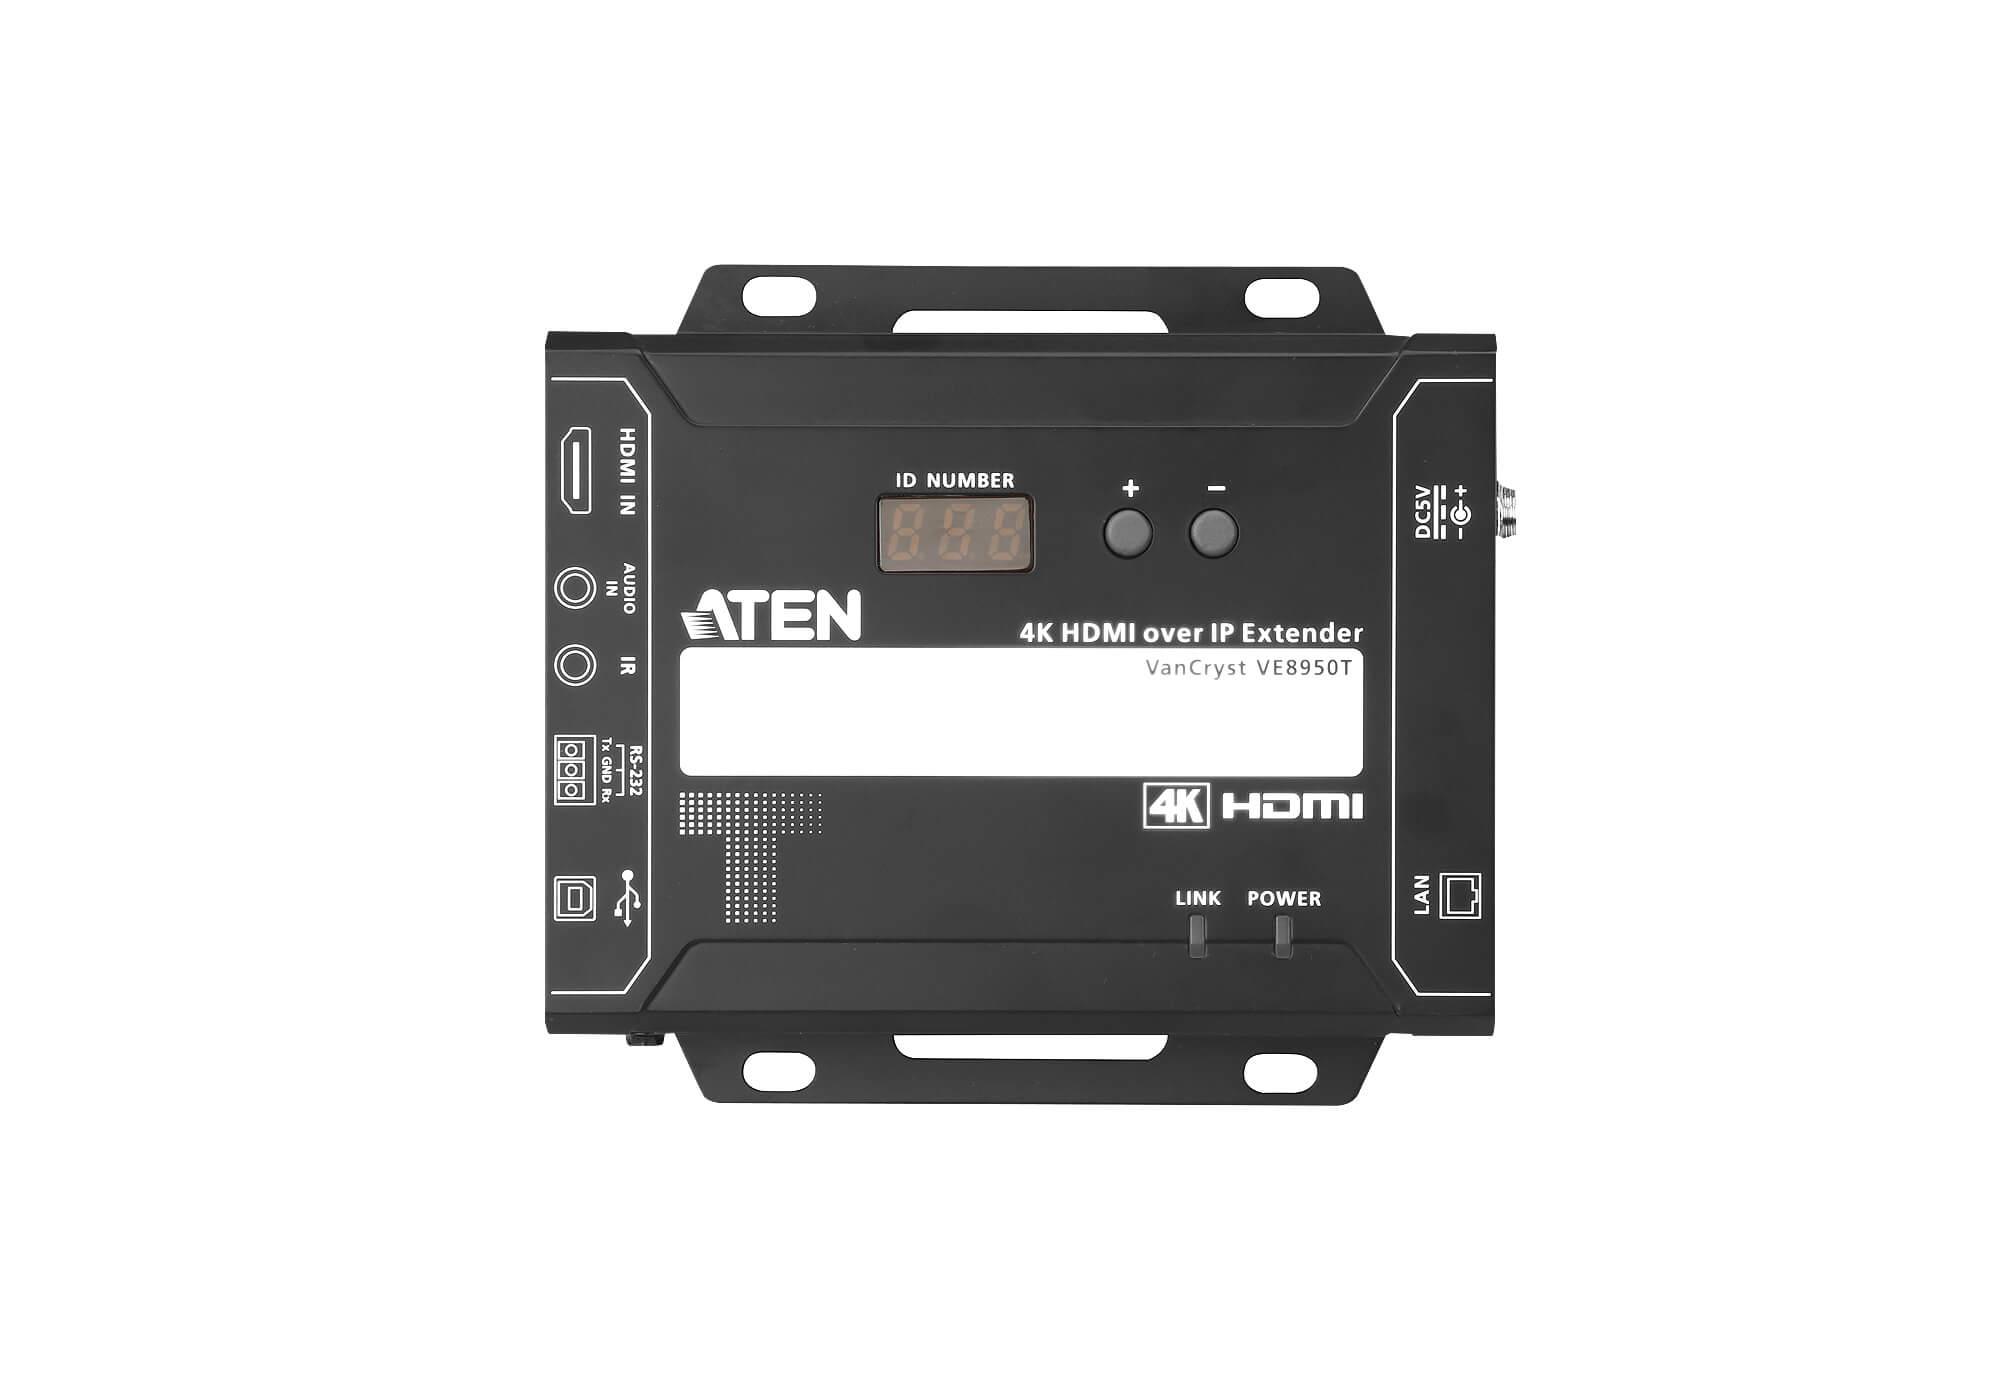 4K HDMI over IP Extender-8